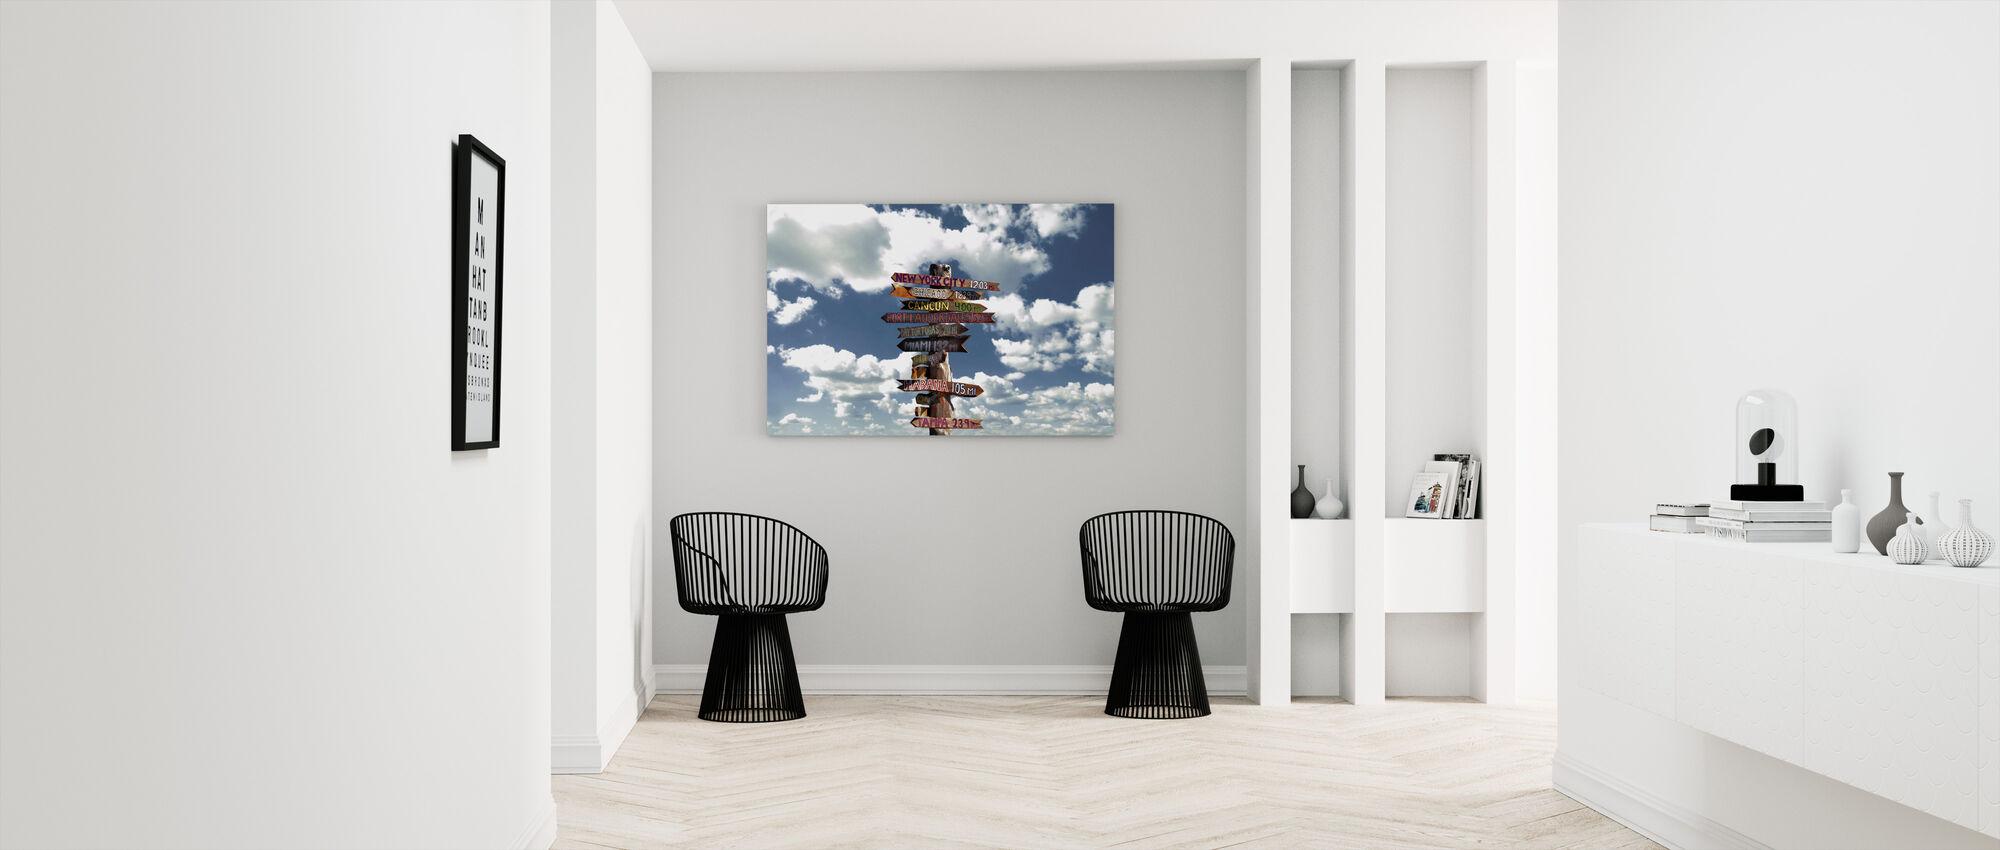 Key West Florida - himmel med träskylt - Canvastavla - Hall